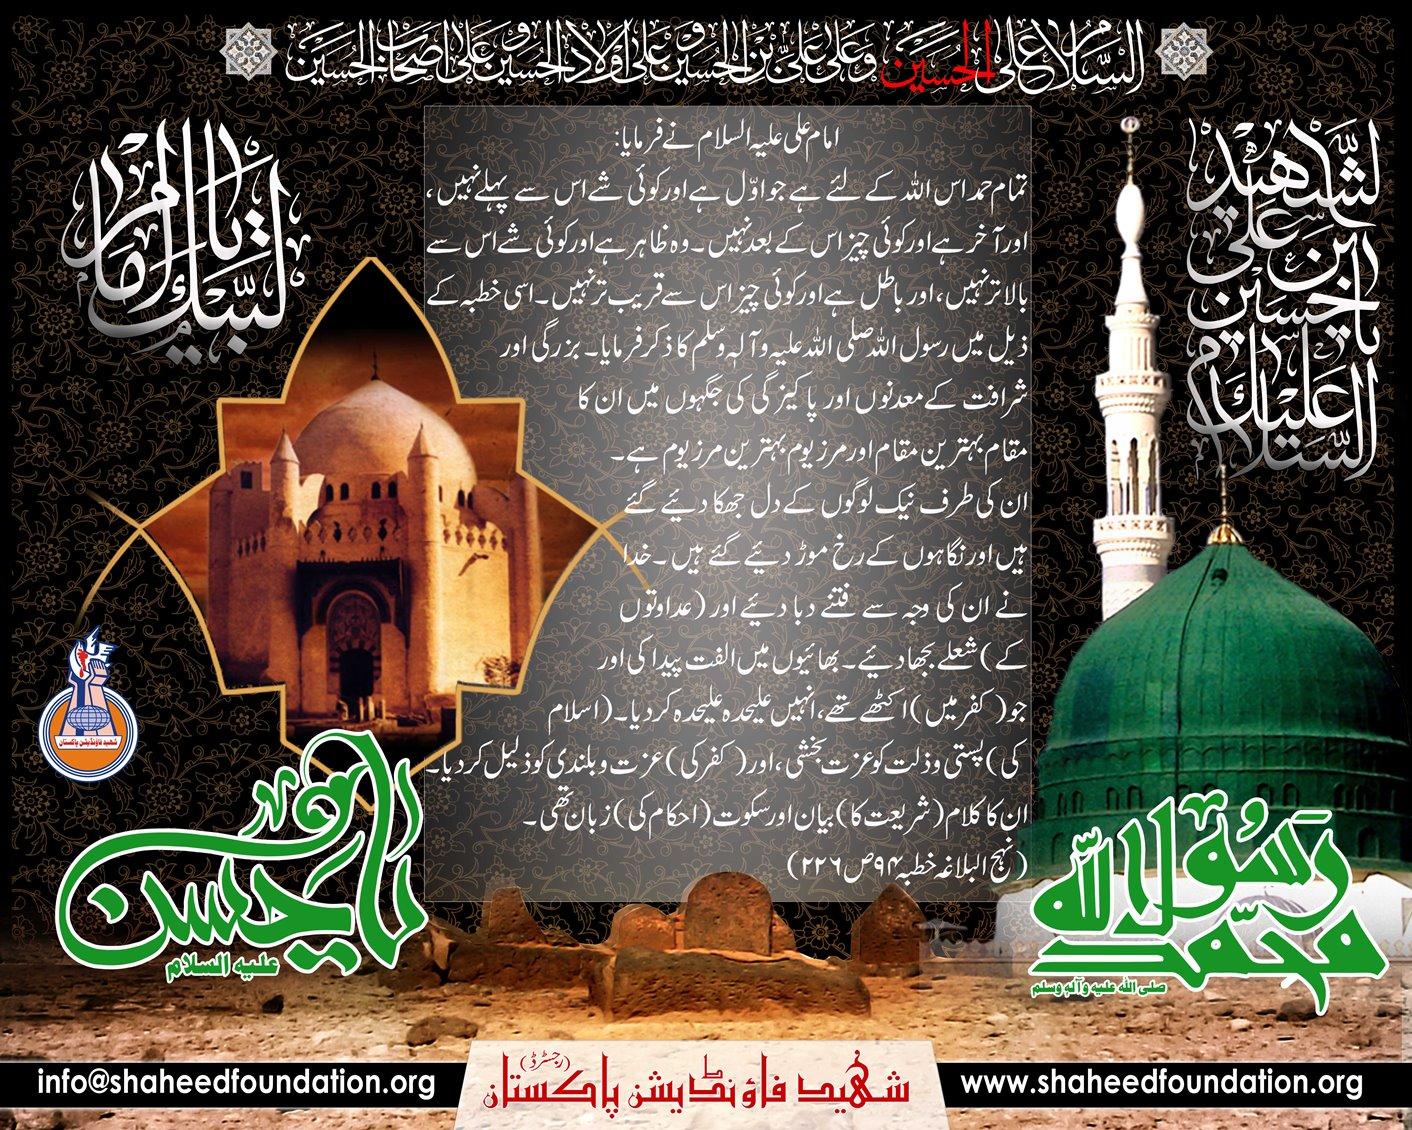 28th Safar: Rehlat-e-Rasool-e-Khuda [S.A.W.W] and Shahadat Imam Hasan Ibn Ali [AS]